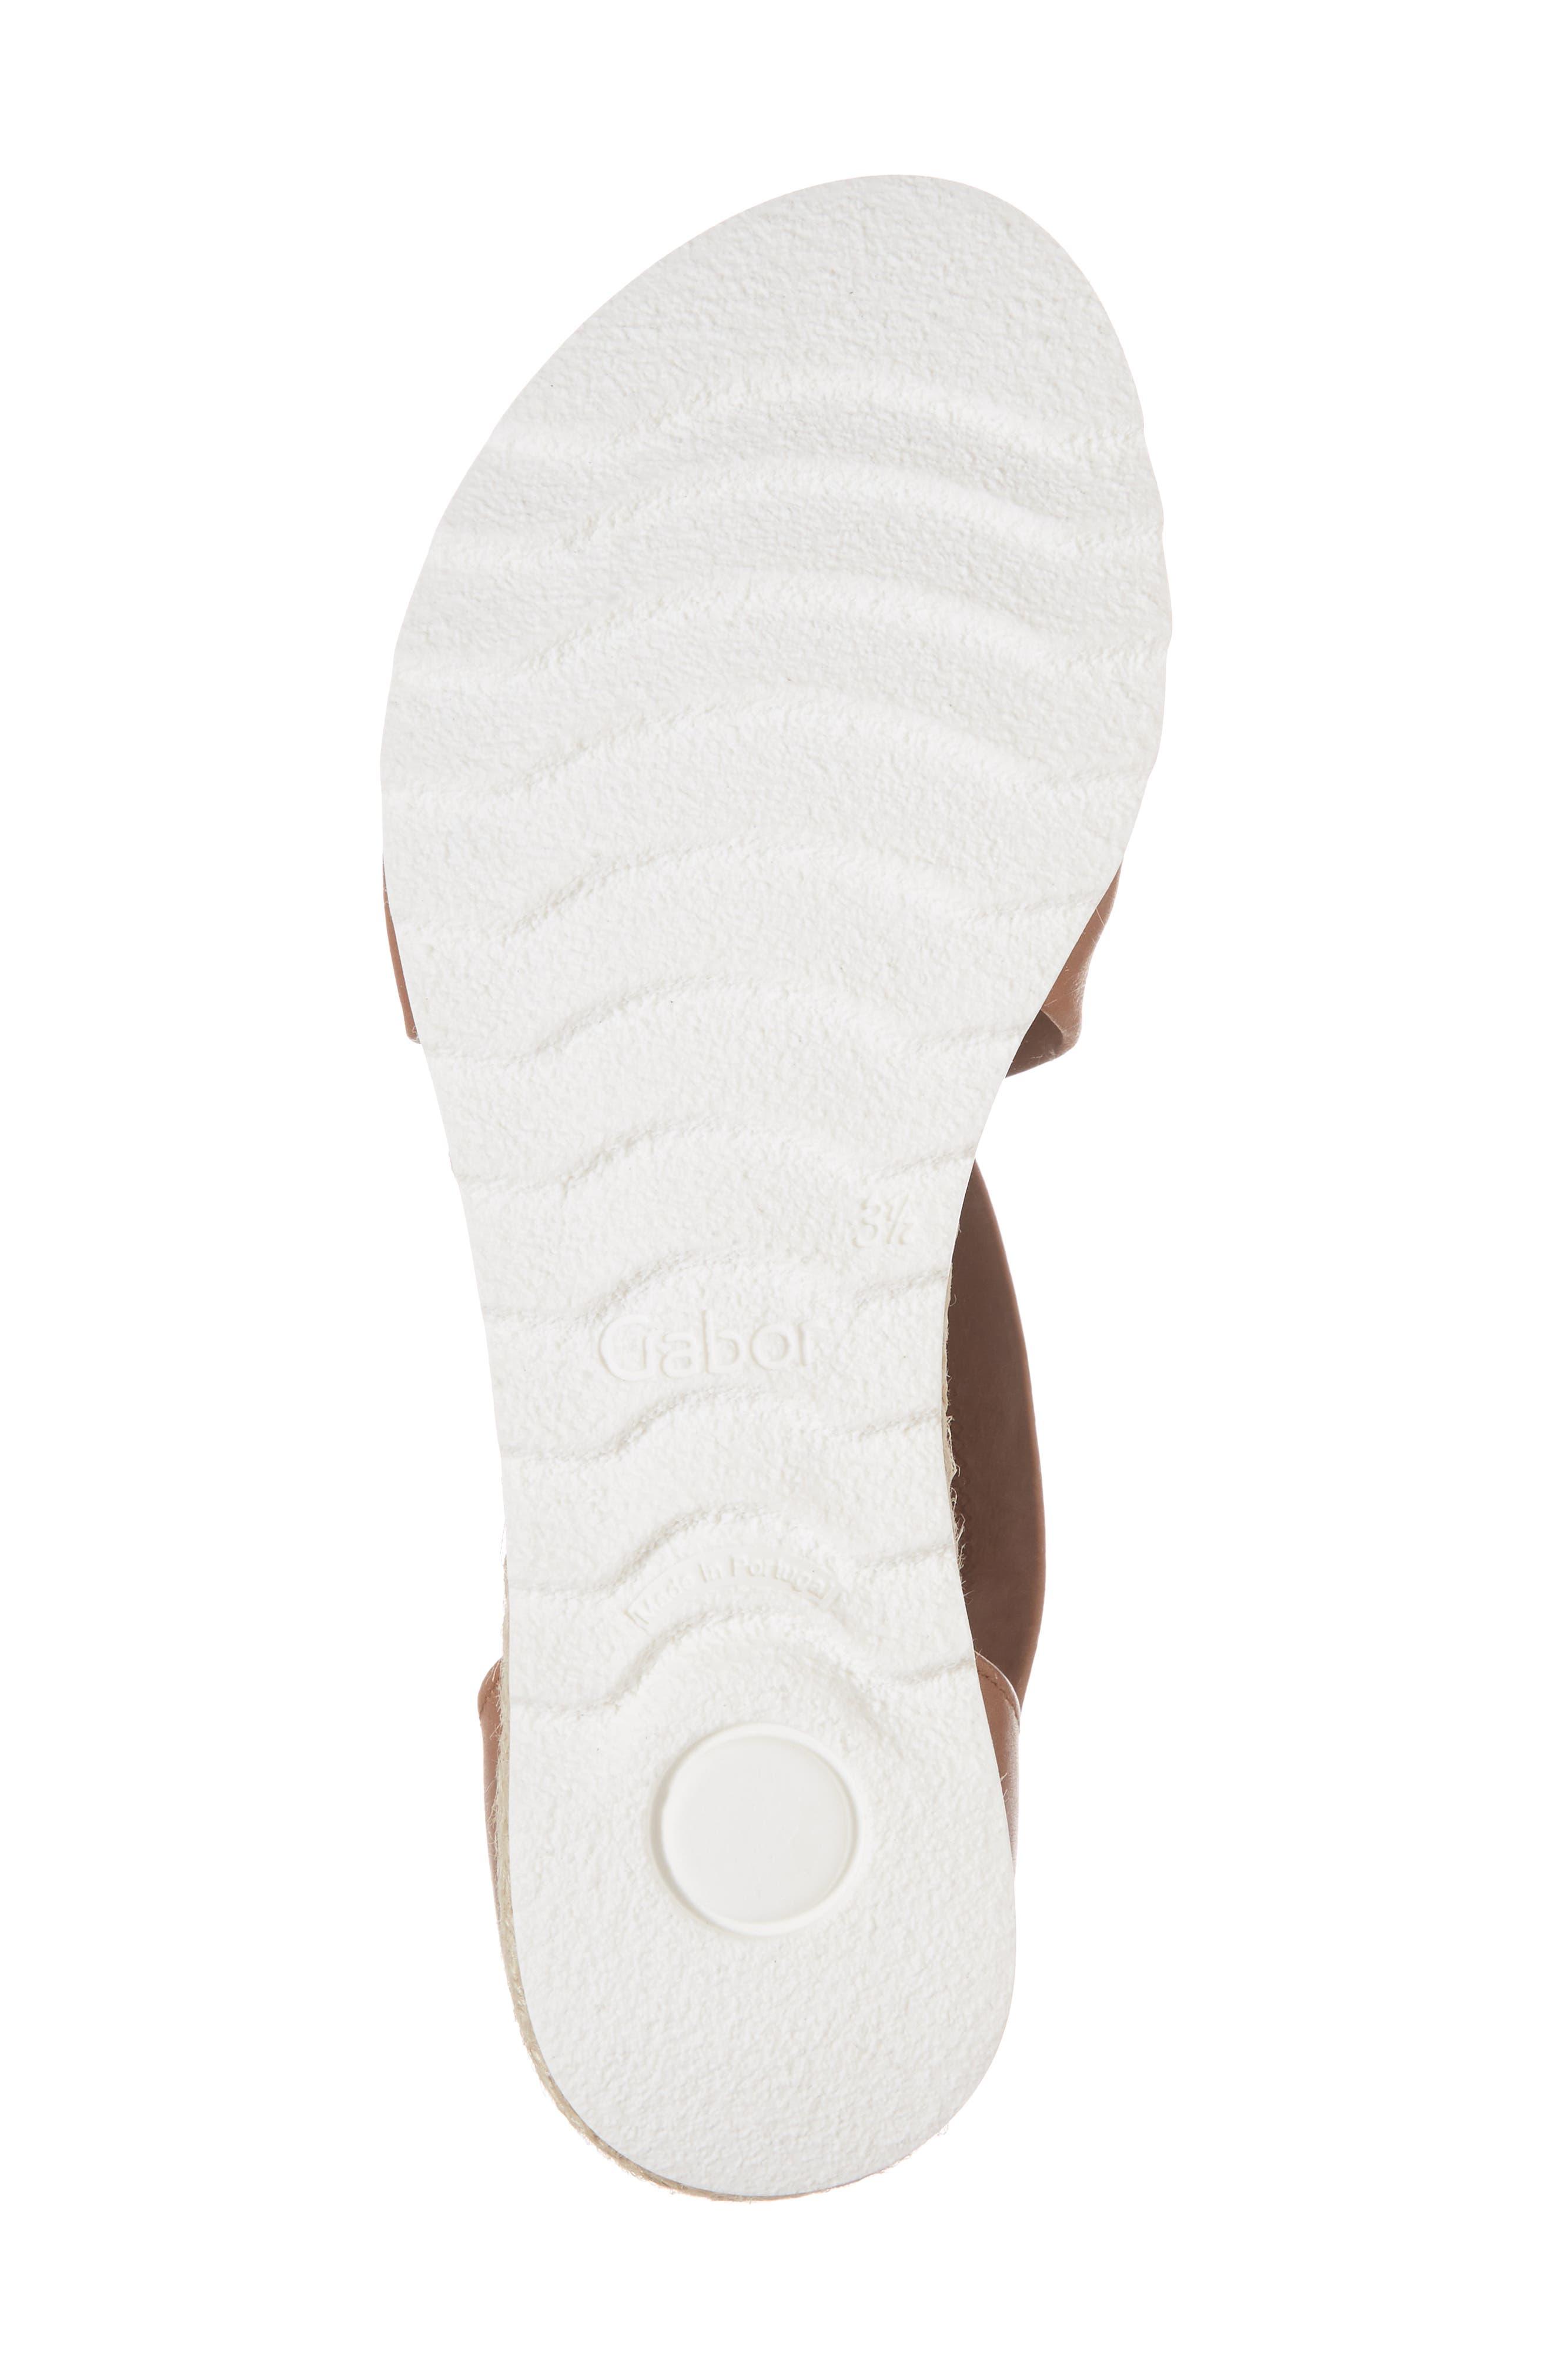 Cross Strap Sandal,                             Alternate thumbnail 6, color,                             Brown Leather